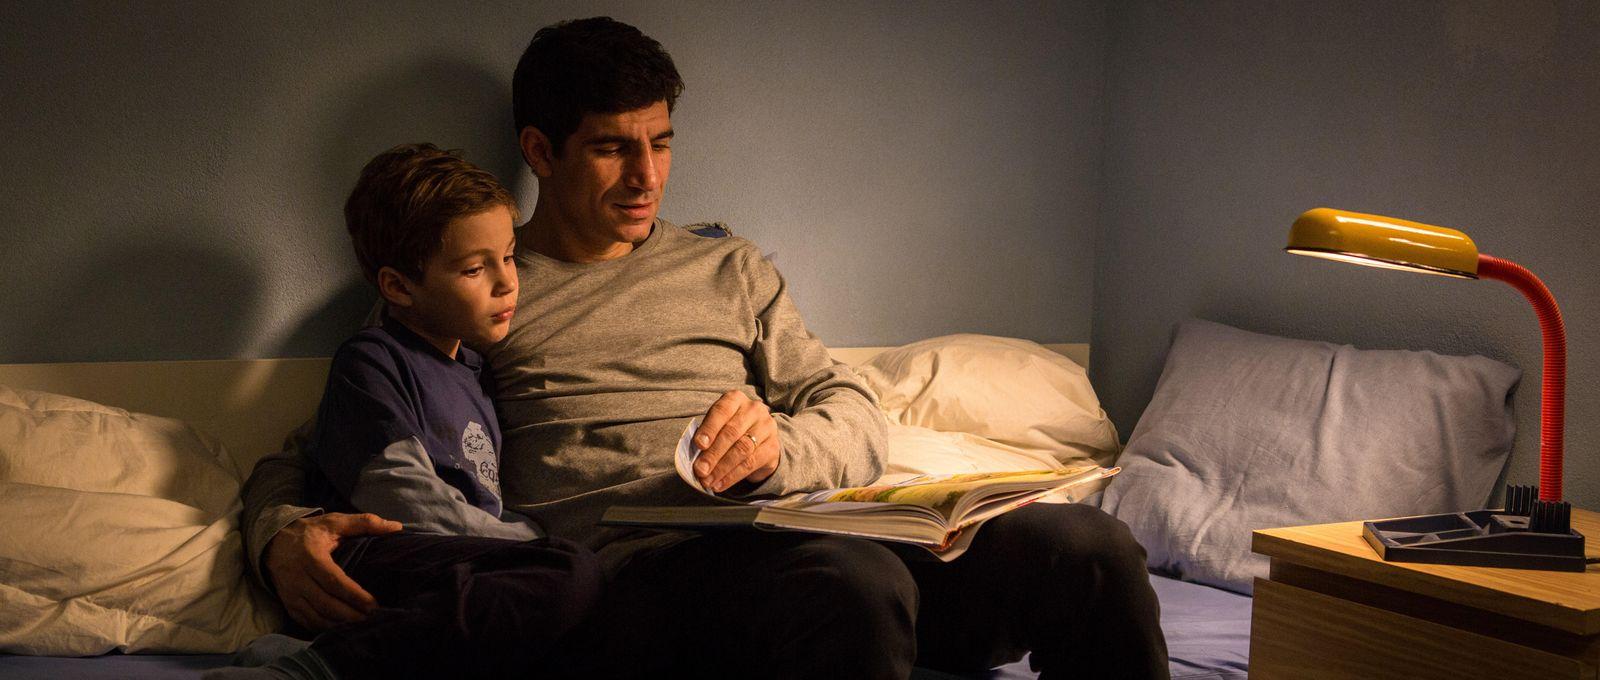 Film Poklad (2015)